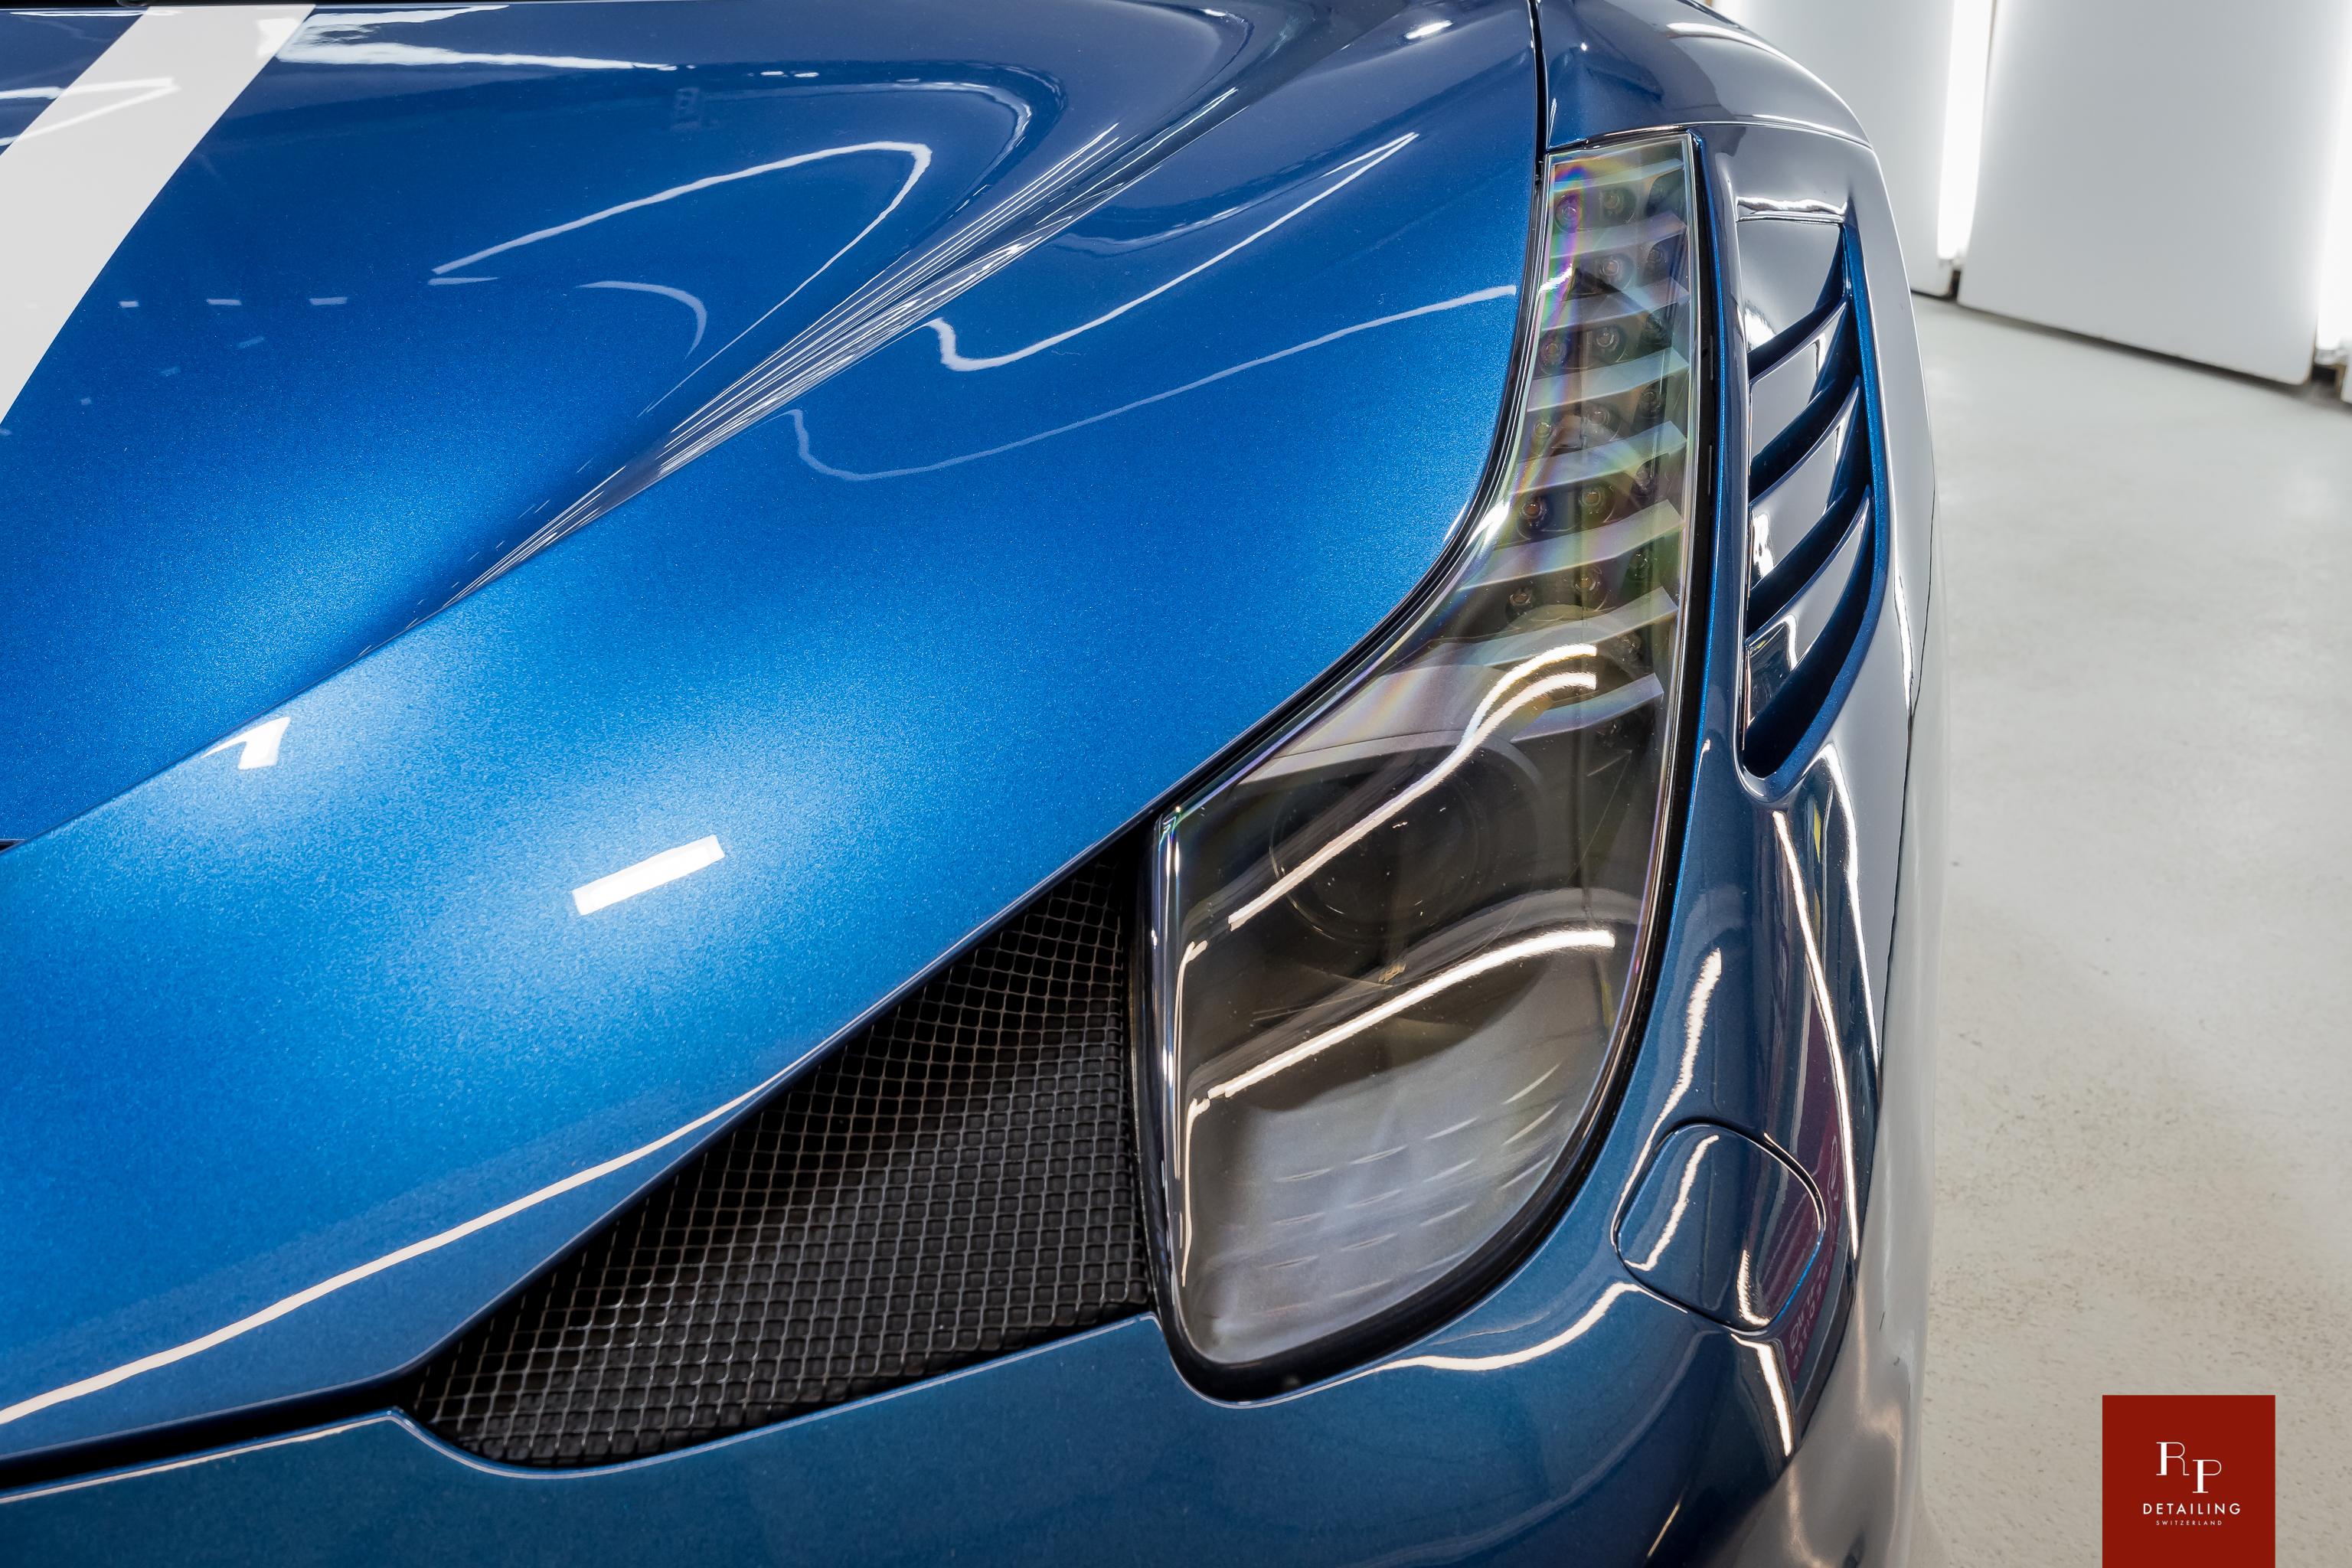 Ferrari%20Speciale%20RP%203.jpg